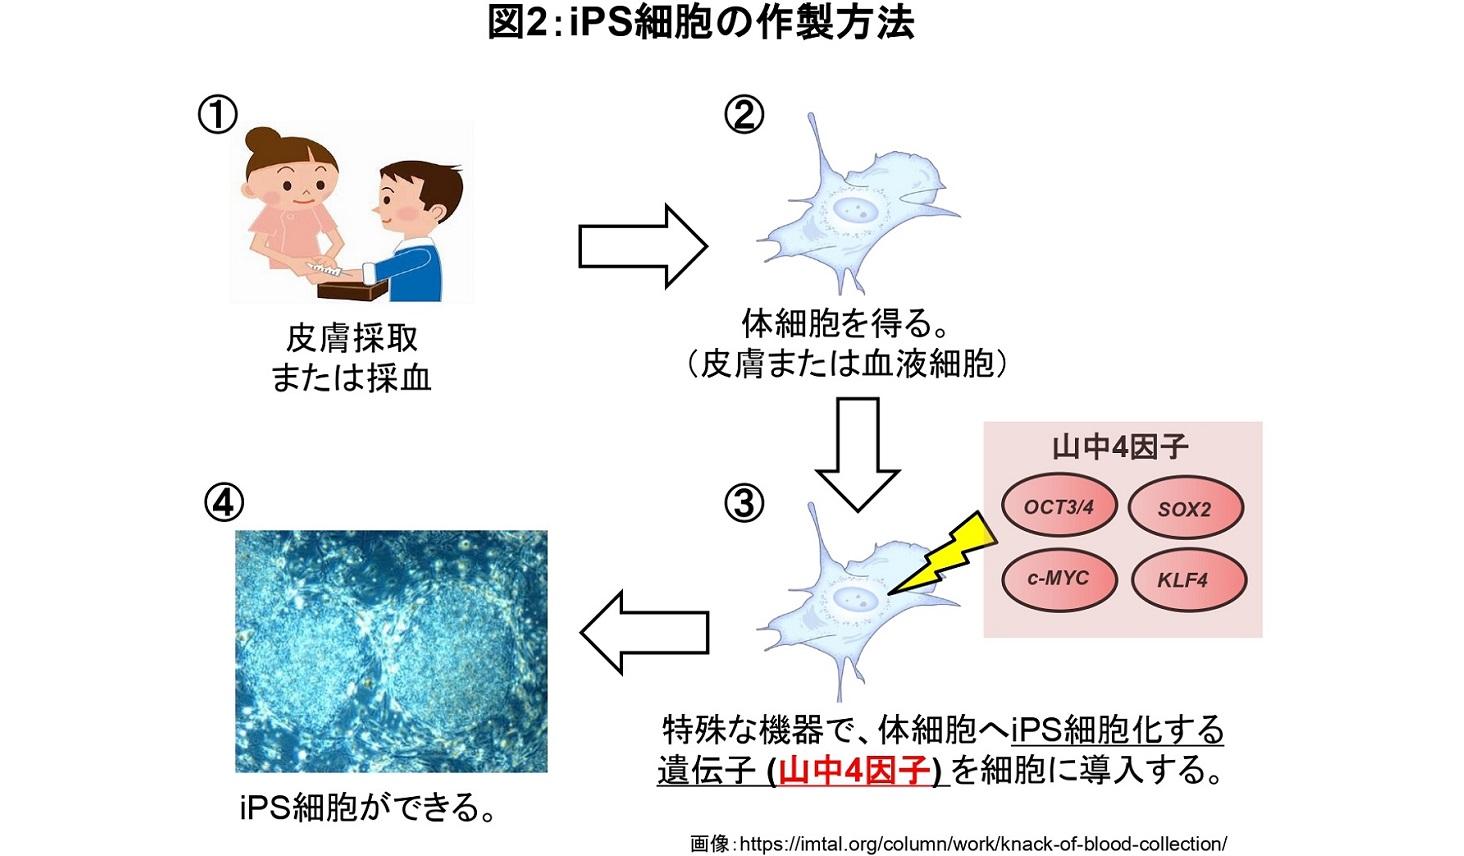 iPS細胞の作製方法の図